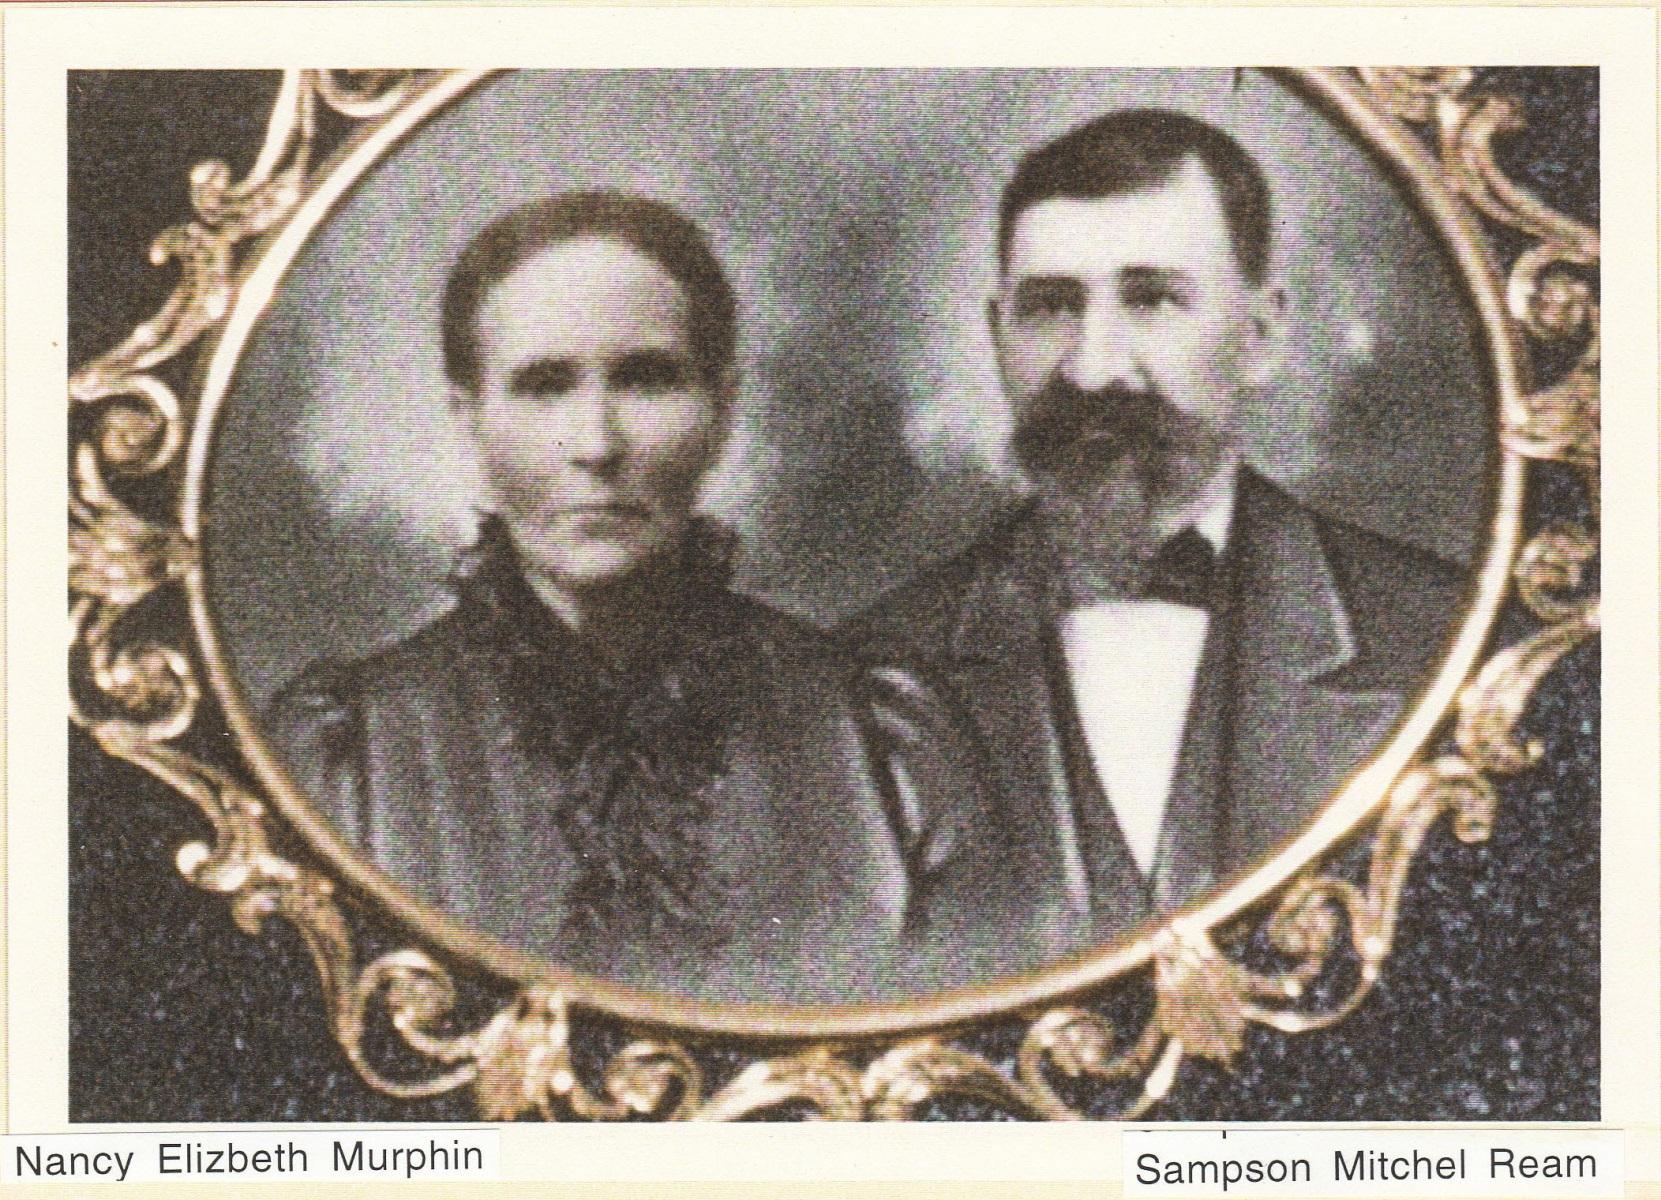 Sampson-Mitchell-Ream-and-Nancy-Elizabeth-Murphin